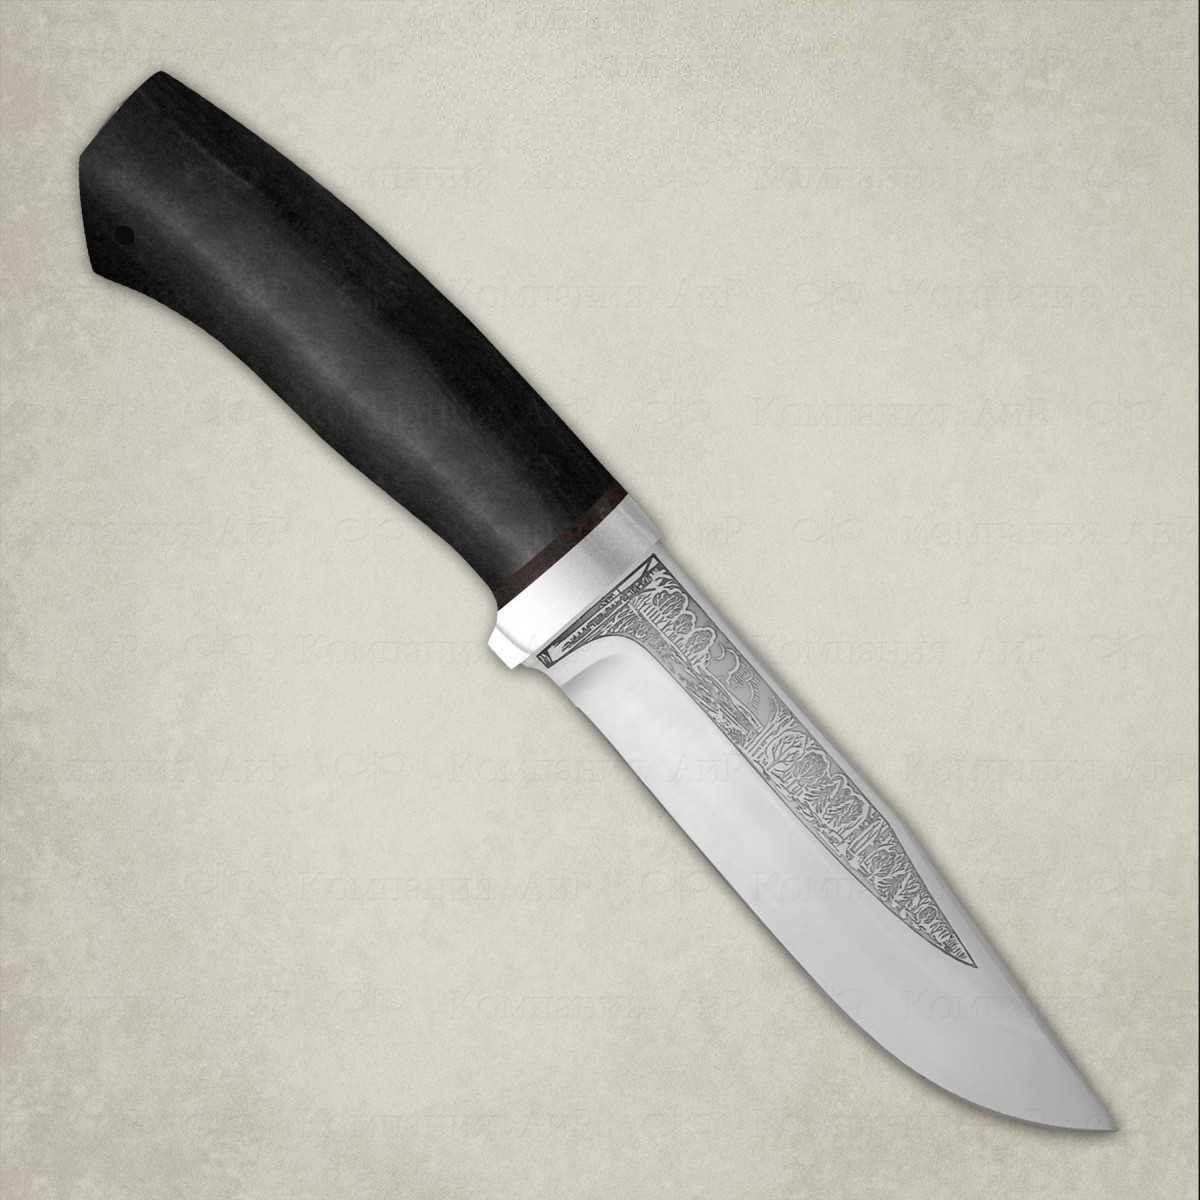 Фото - Нож АиР Турист, сталь 110х18 М-ШД, рукоять граб нож казацкий засапожный сталь 110х18 рукоять граб